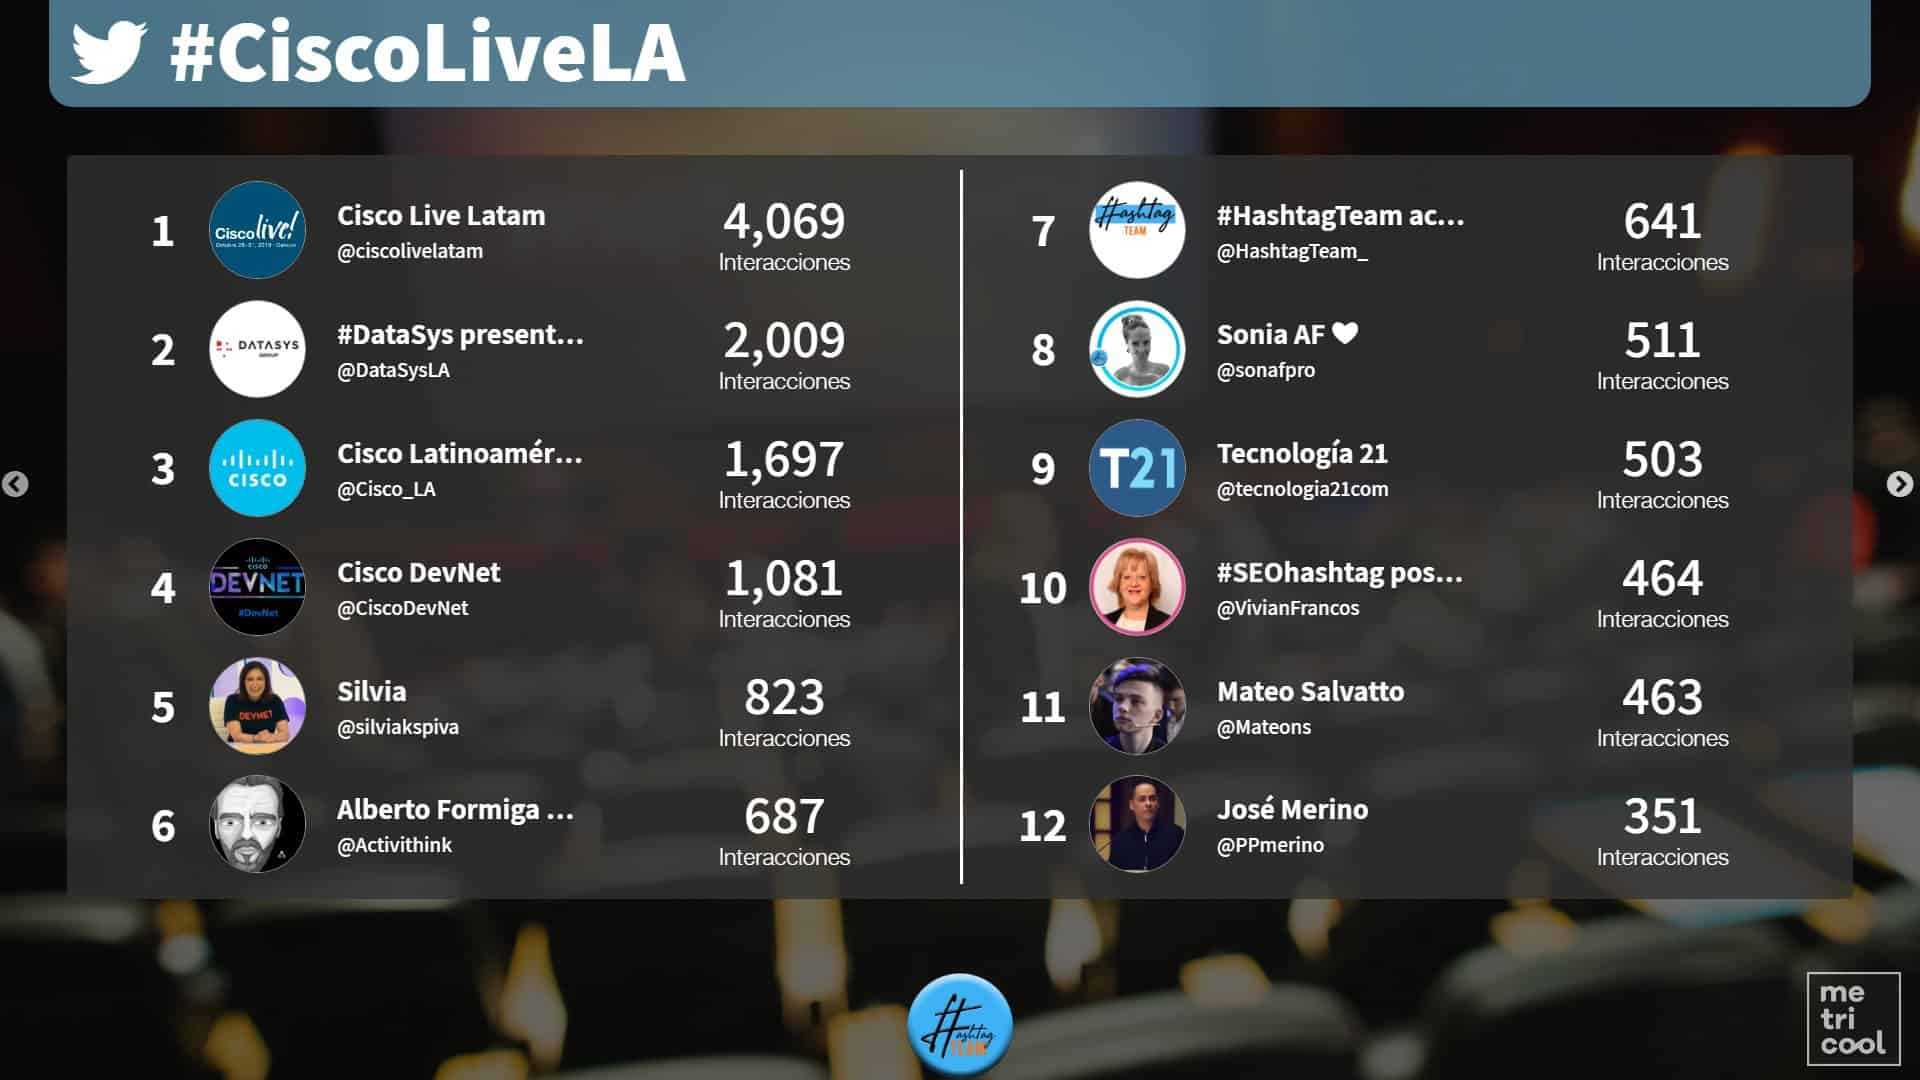 #DataSys #CiscoLiveLA #Metricool #HashtagTeam